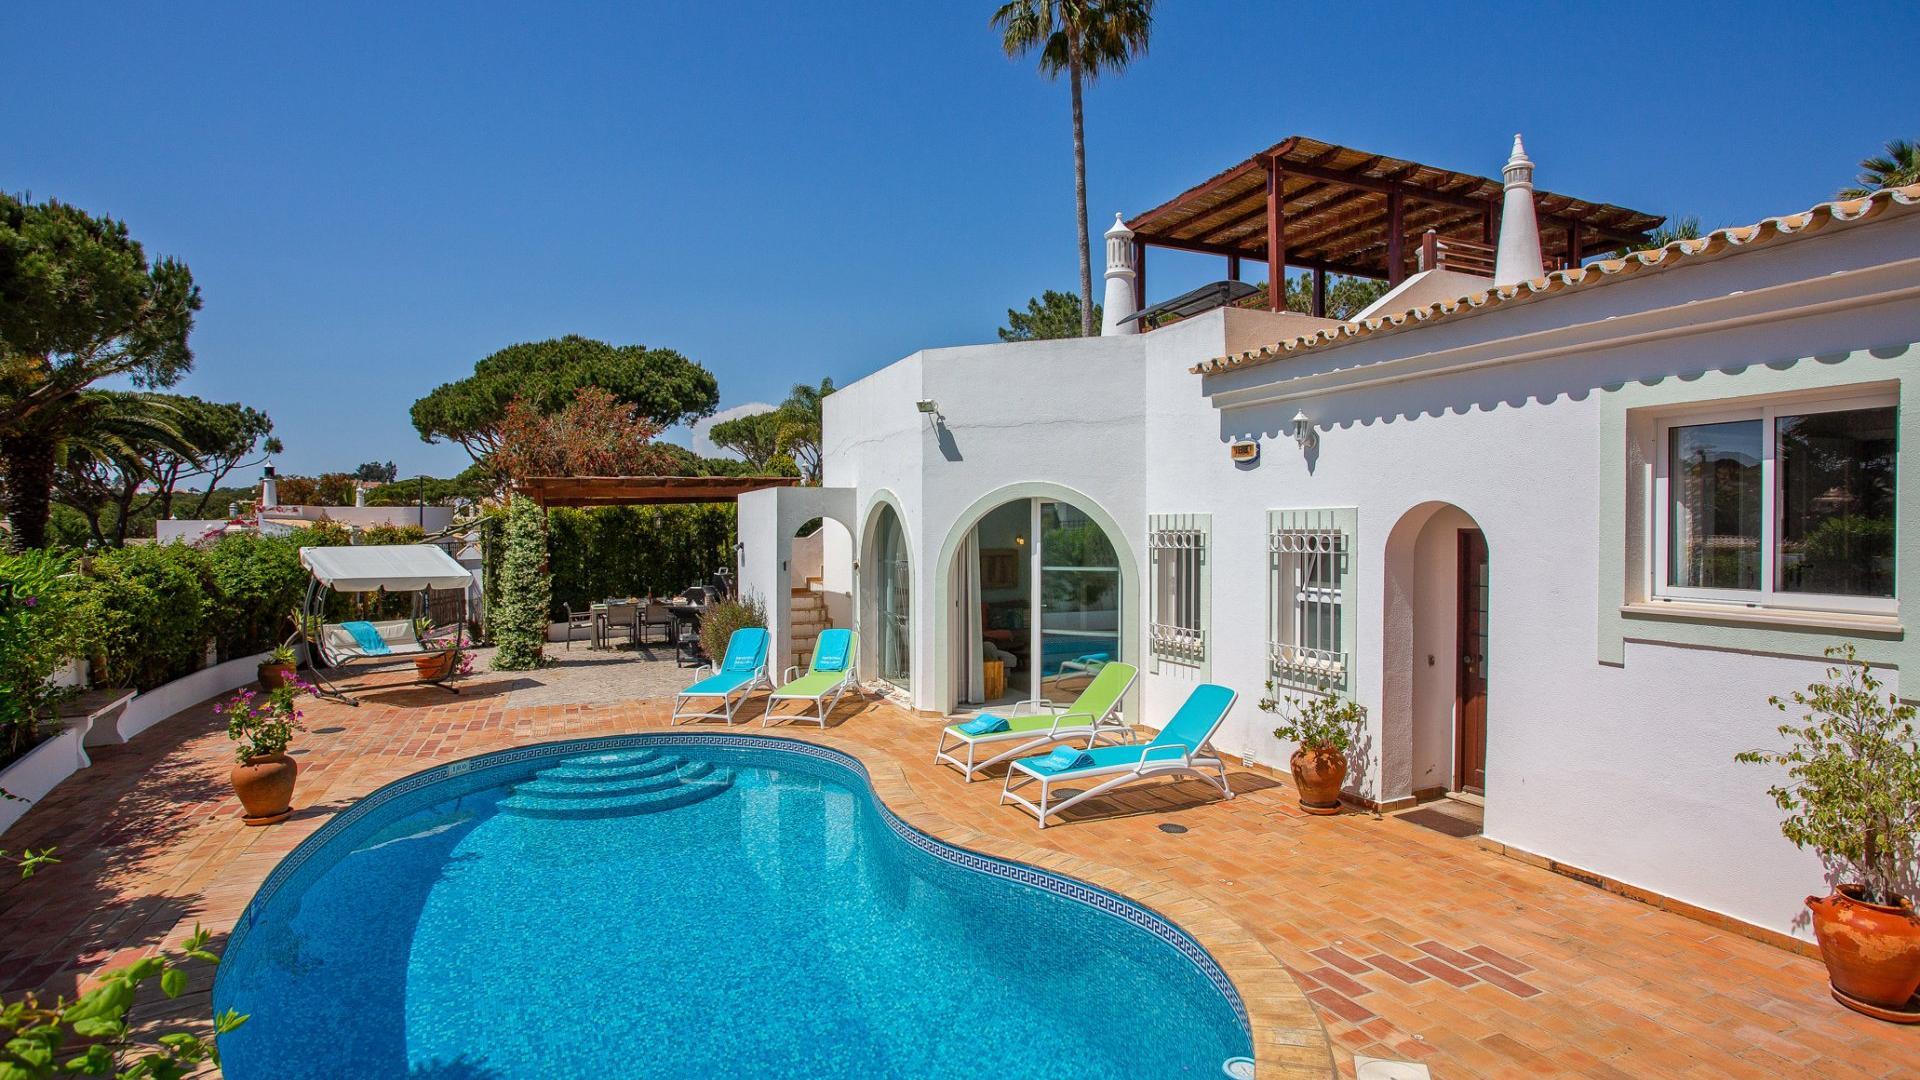 Villa Gela-Mar - Dunas Douradas, Vale do Lobo, Algarve - _P1_9822.jpg